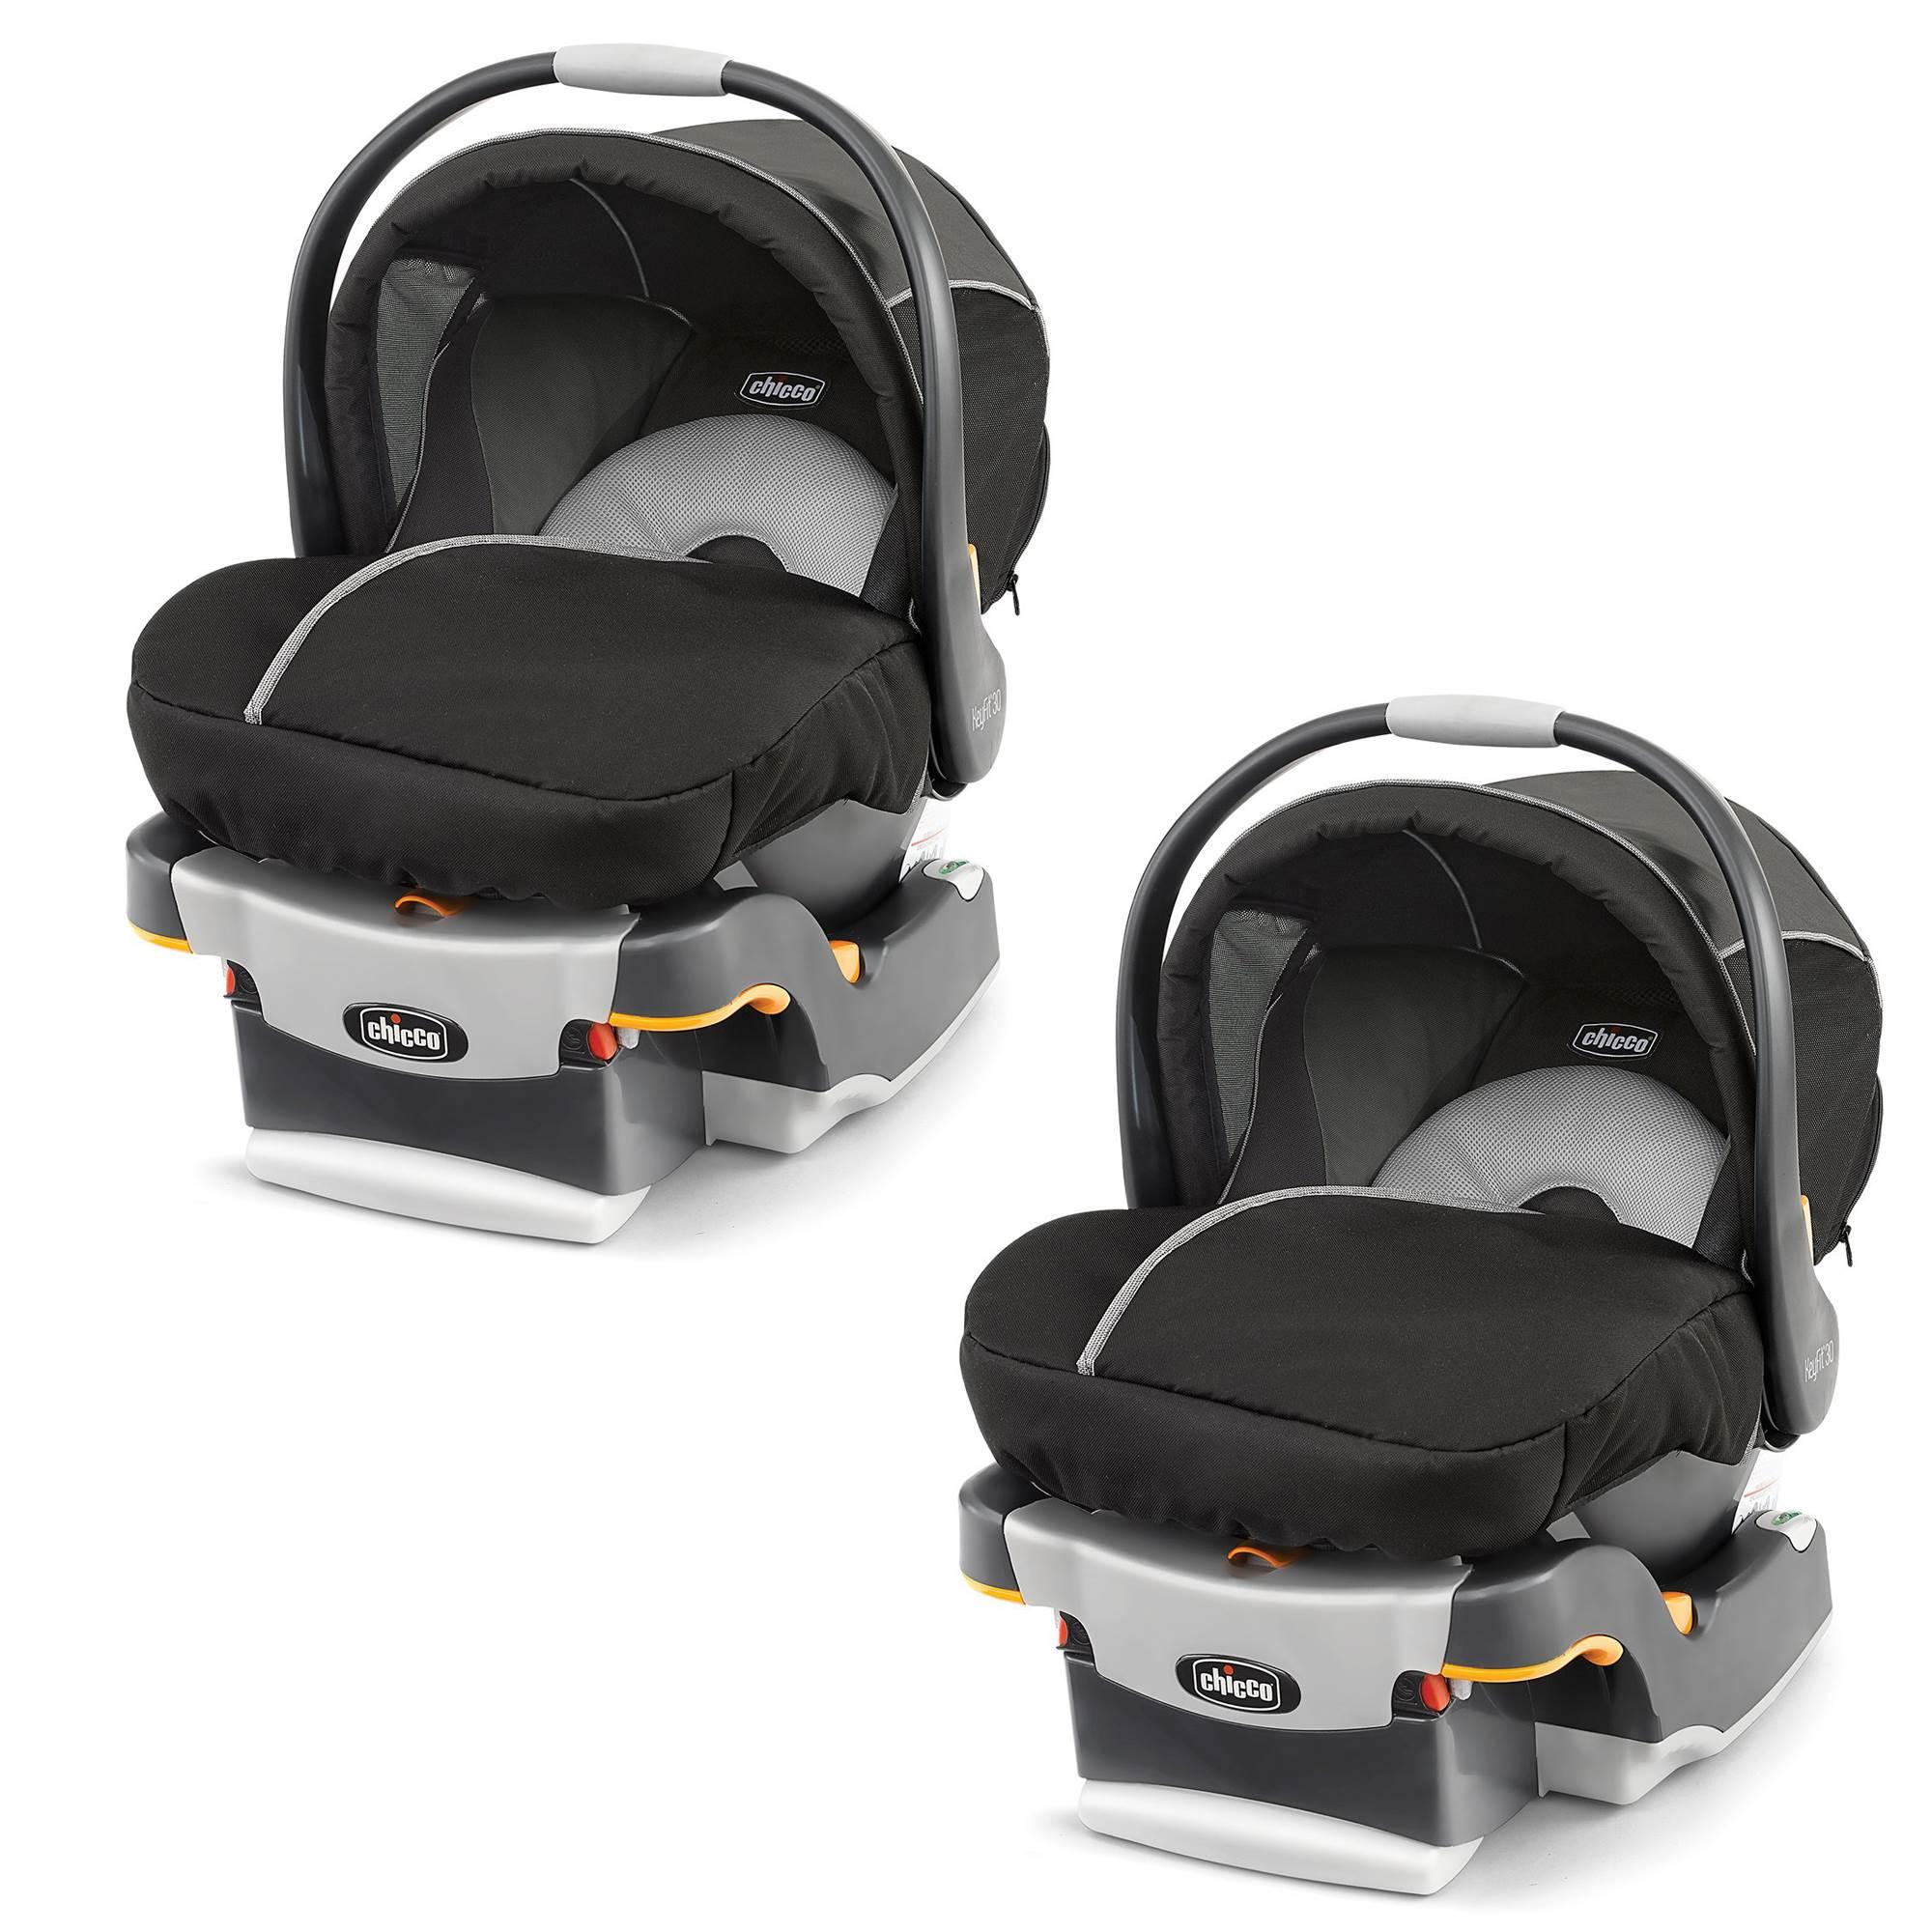 Coal Chicco KeyFit 30 Magic Infant Car Seat